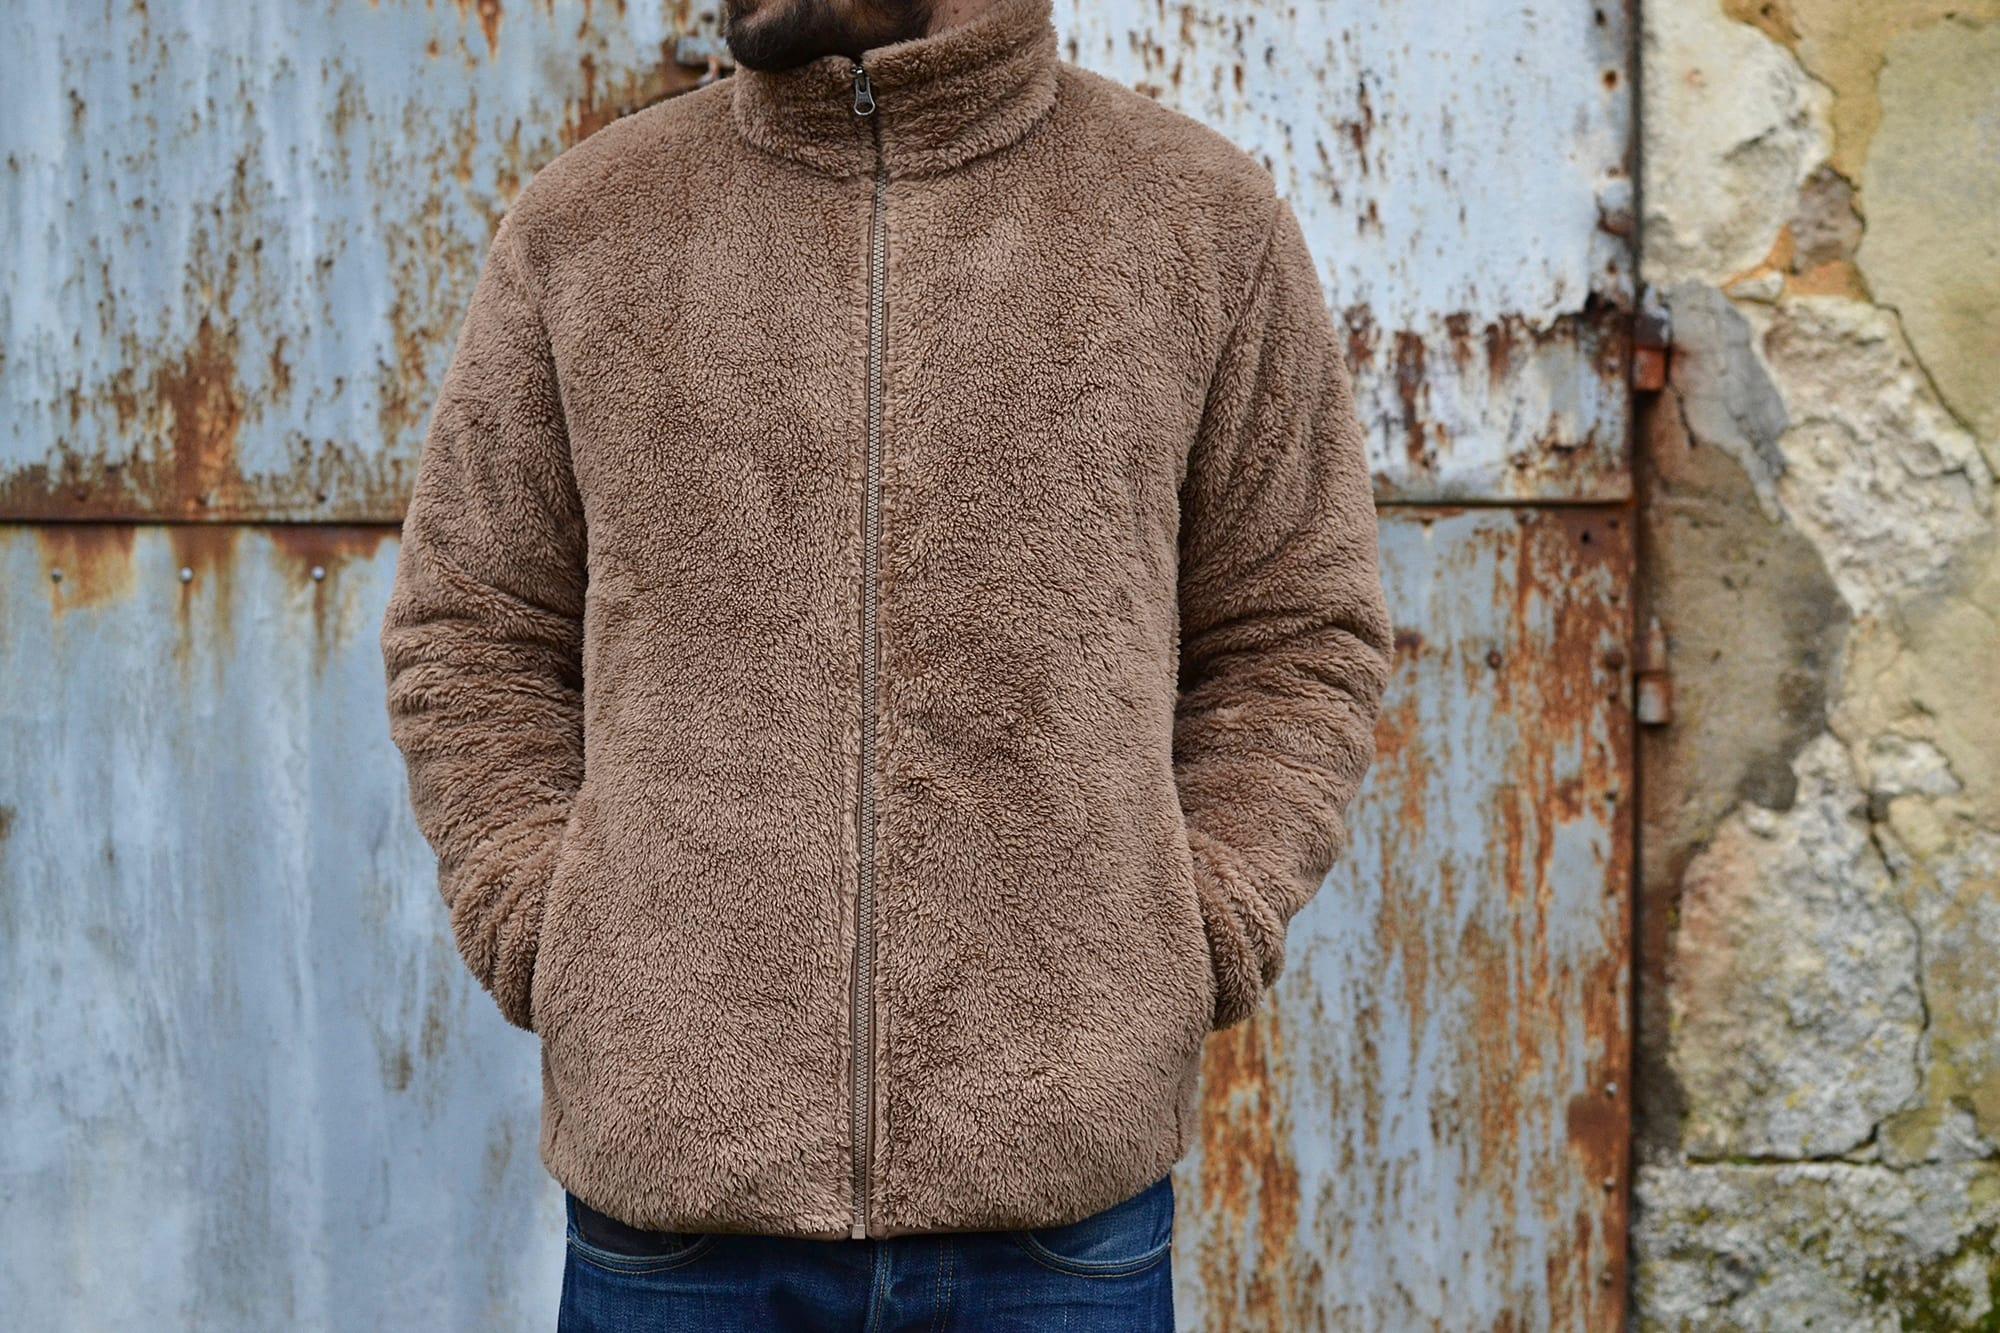 polaire façon peluche mouton fleexe uniqlo